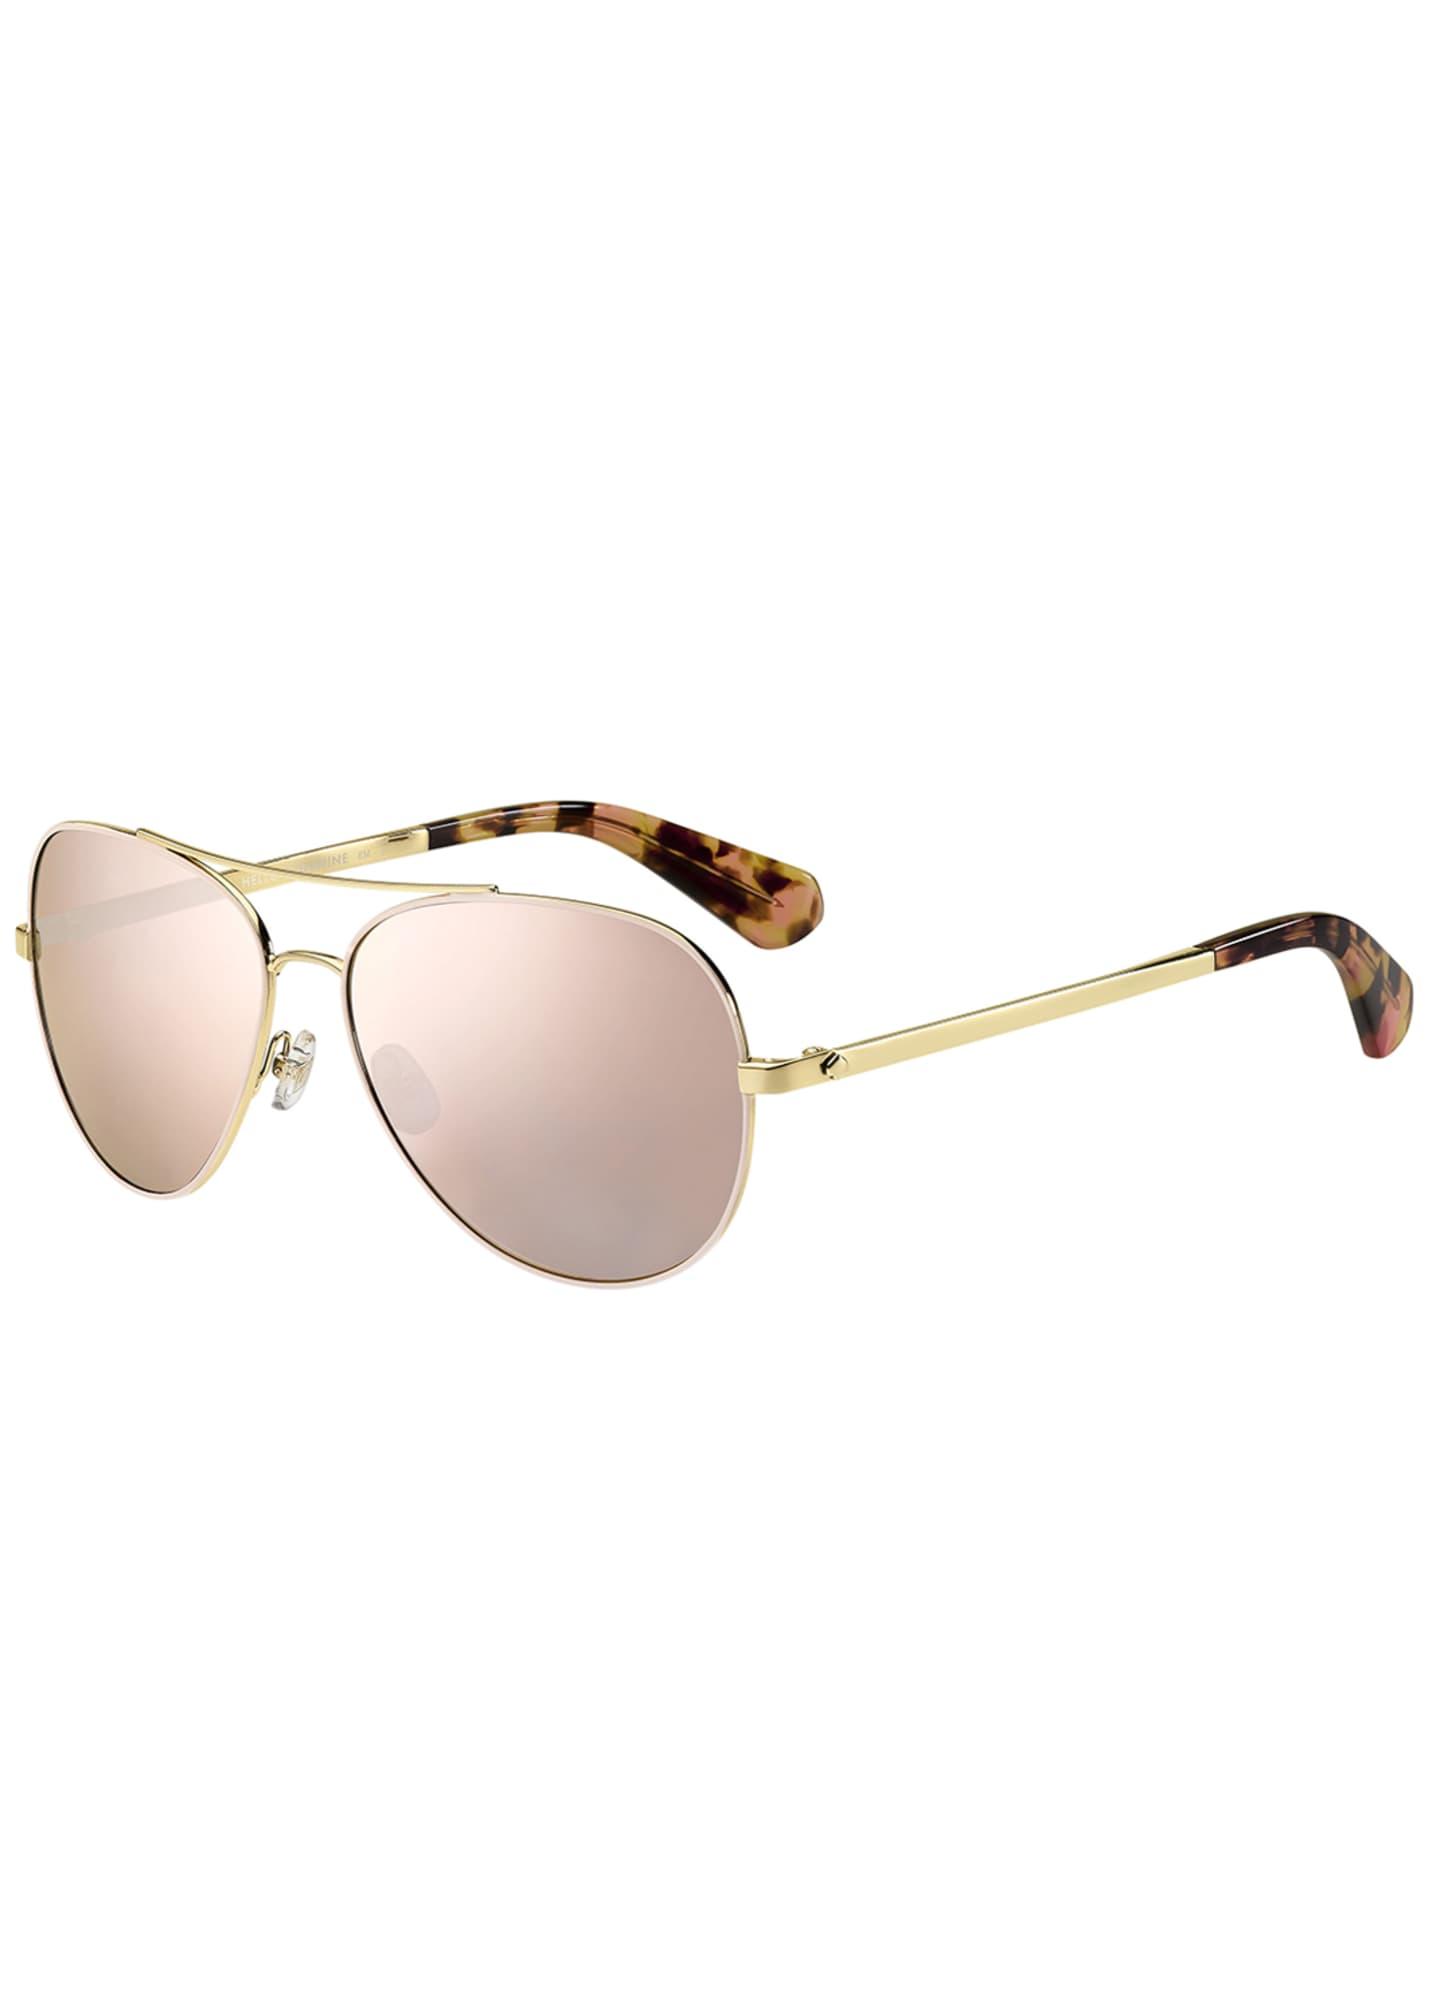 kate spade new york avaline mirrored aviator sunglasses